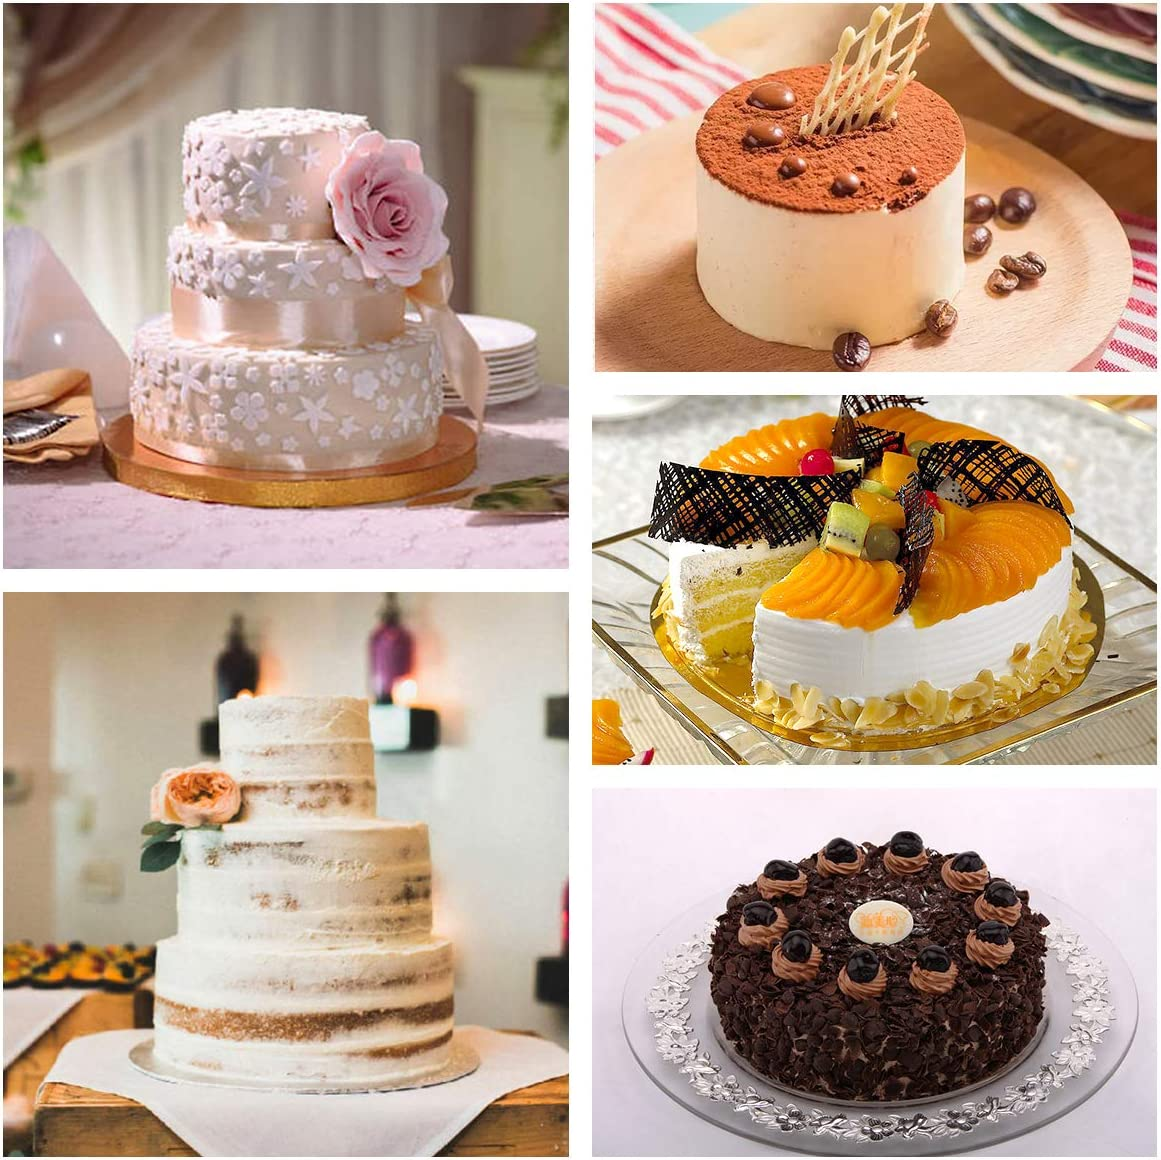 12Pcs Silicone Round Chiffon Cake Mold Silicone Chiffon Dessert Baking Tool